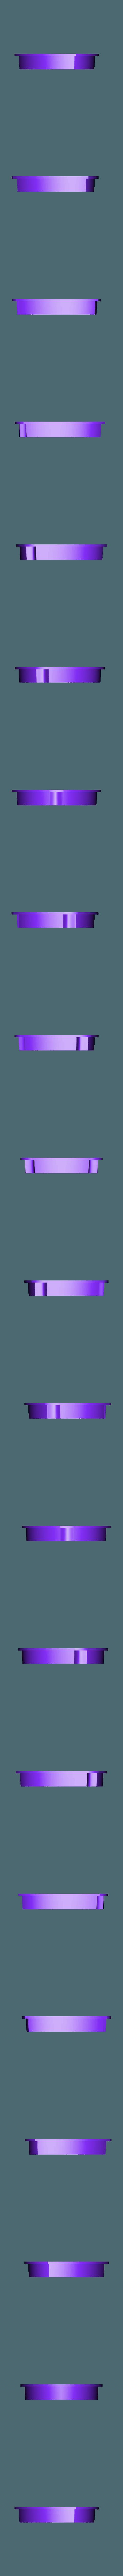 Bleu contour logo.STL Download STL file Patrol Punch (Paw Patrol) • 3D print object, Chris-tropherIlParait